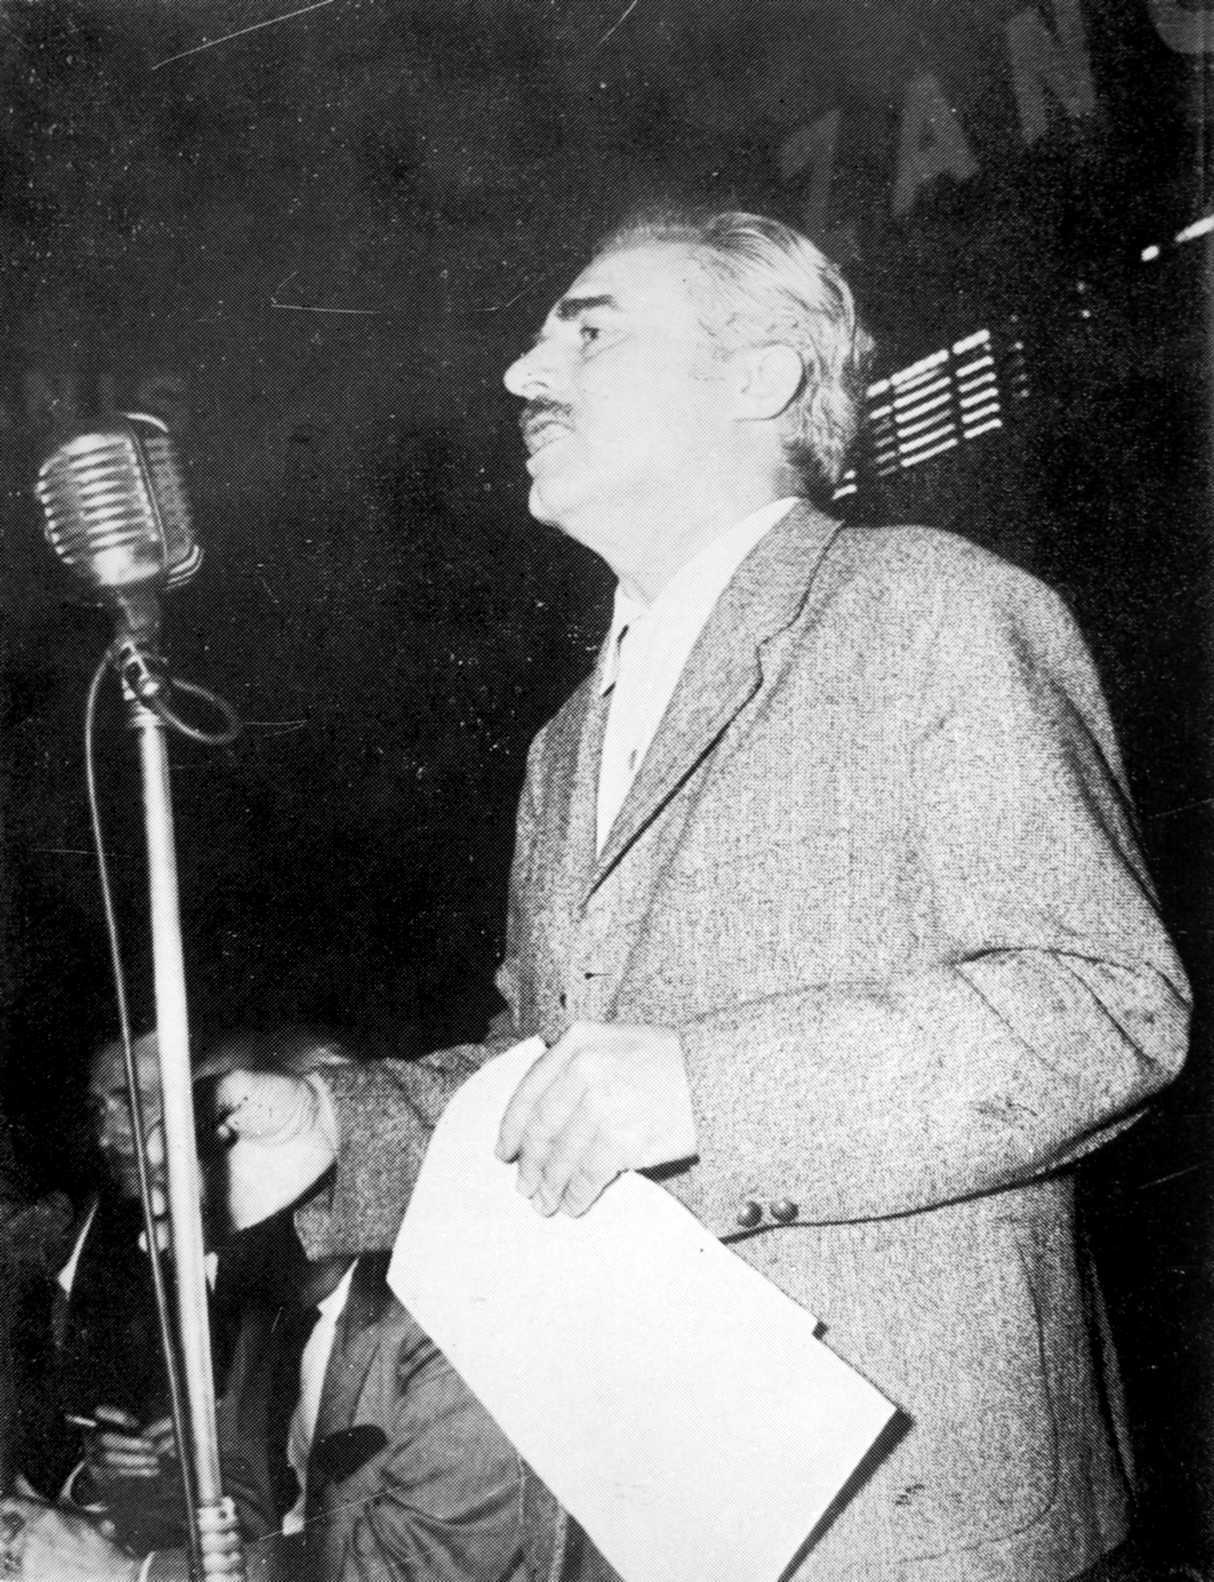 Luis Danussi en una assemblea al Luna Park (1958)